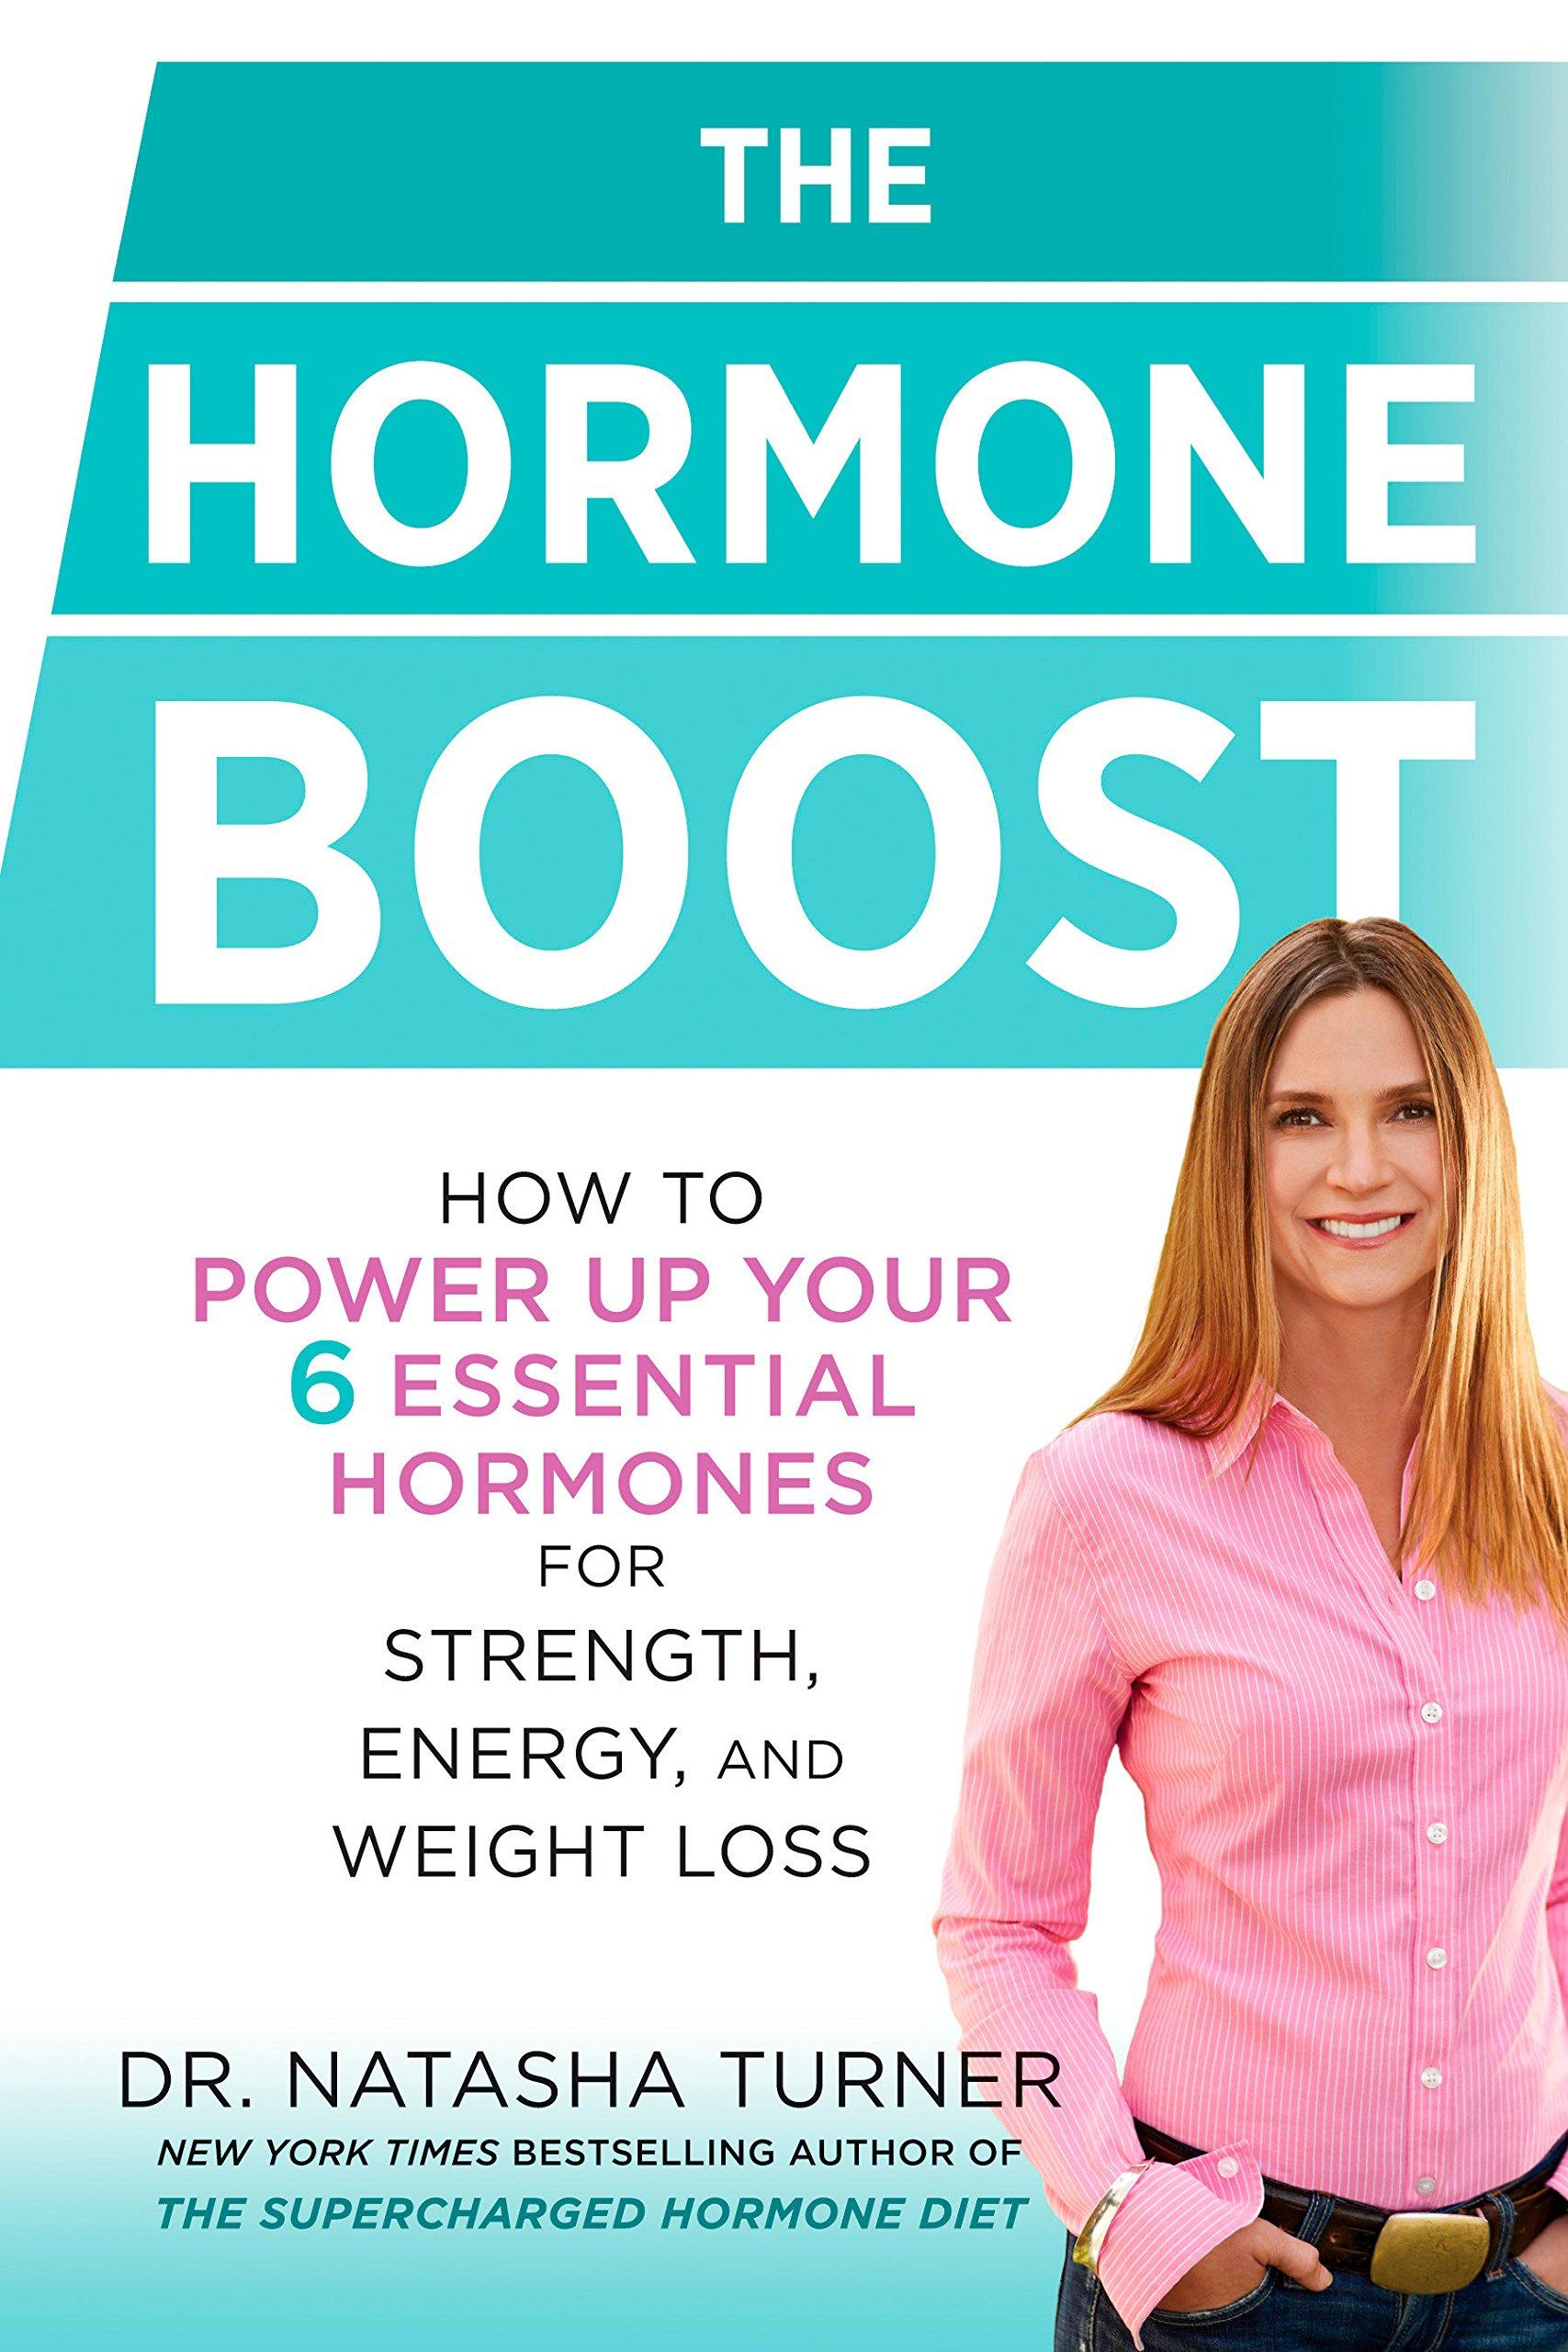 Supercharged hormone diet supplements